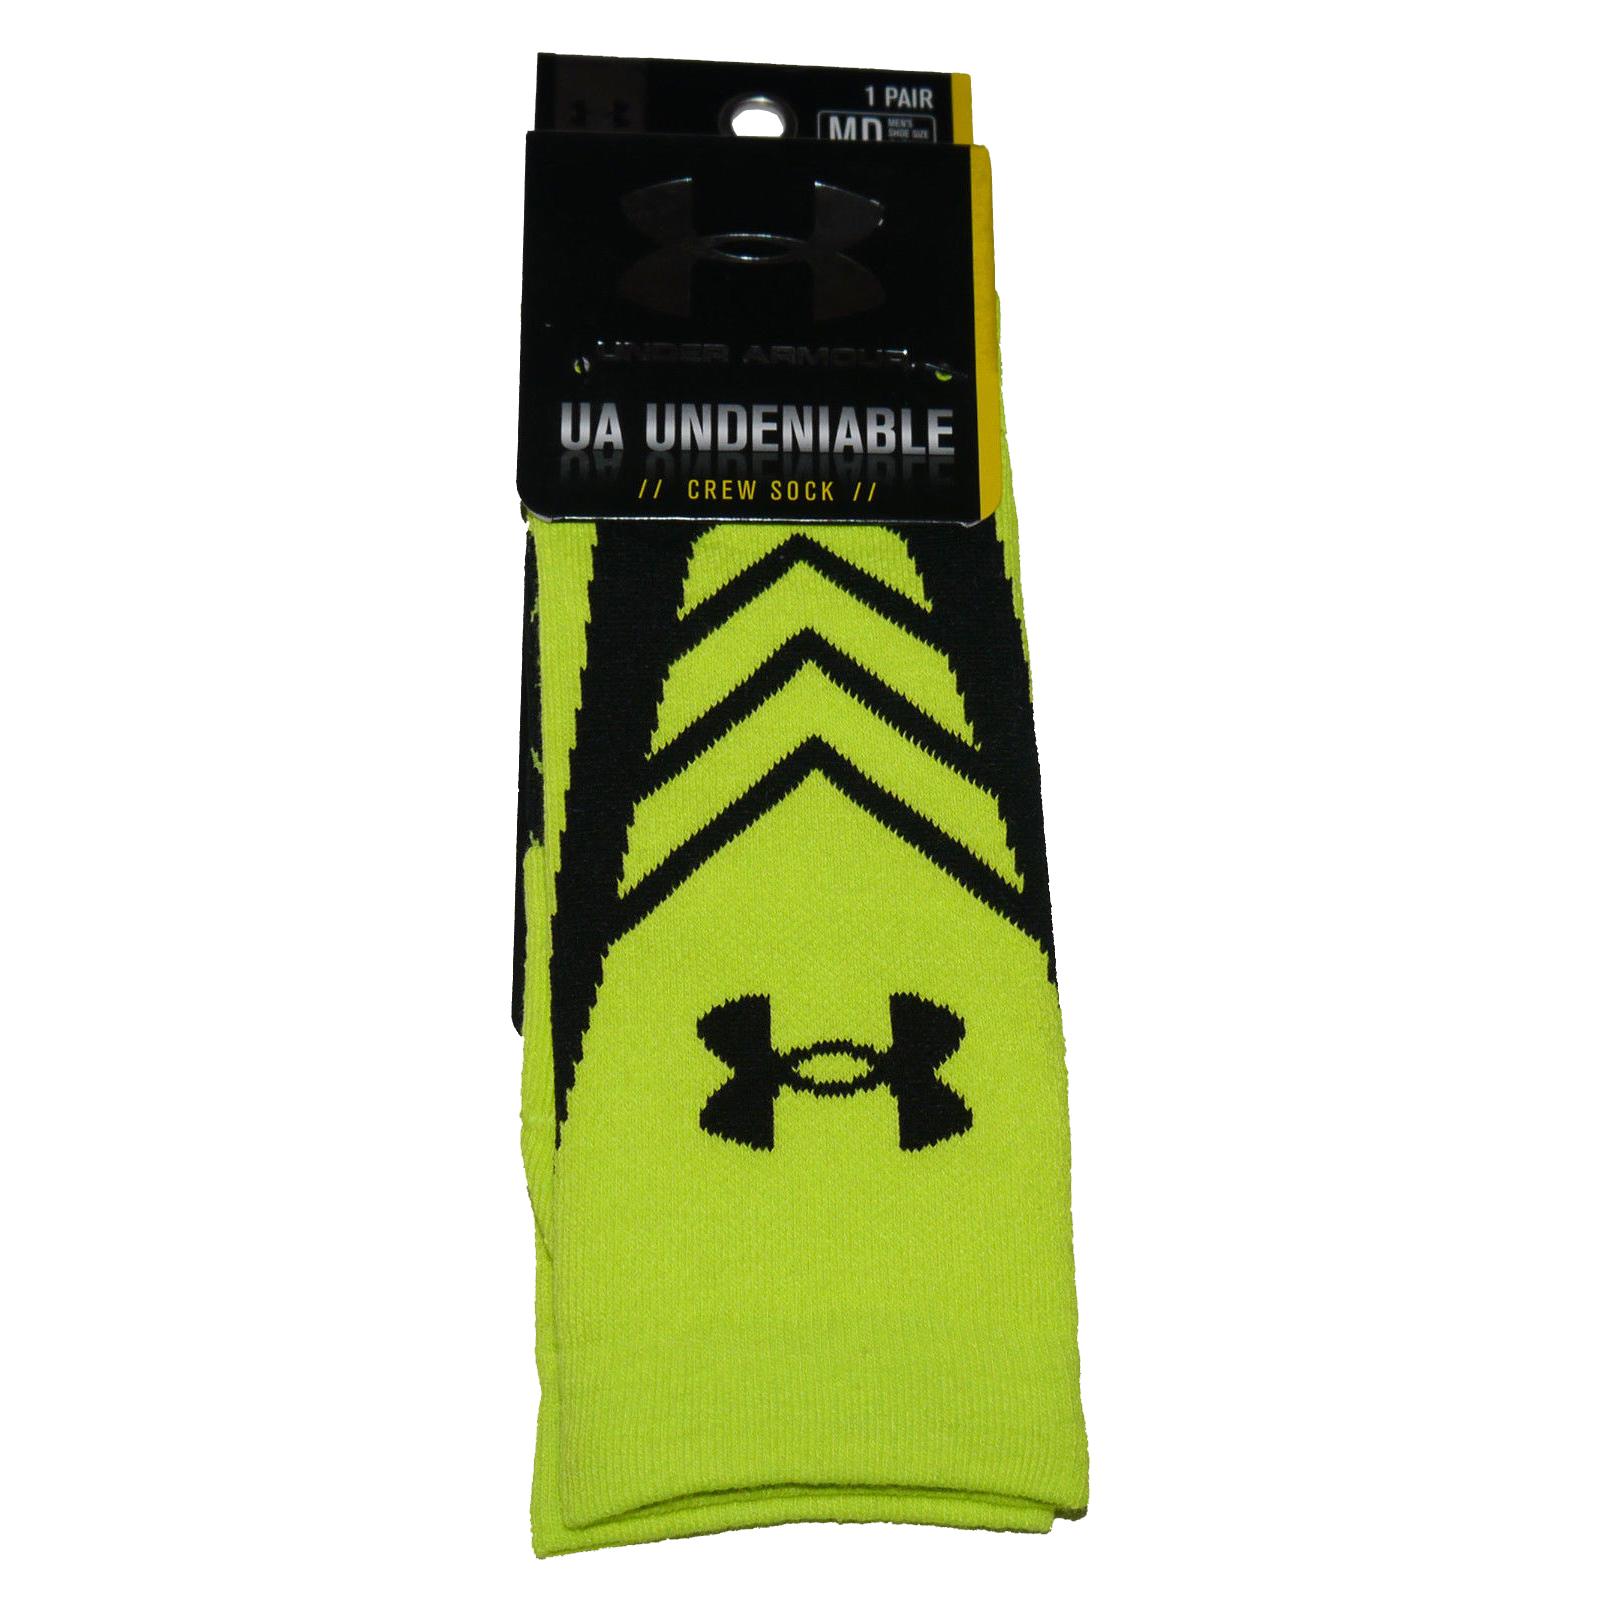 1 Pair Under Armour UA UNDENIABLE Men's Crew Socks  -High Vis Yellow and Black (Medium) 13055